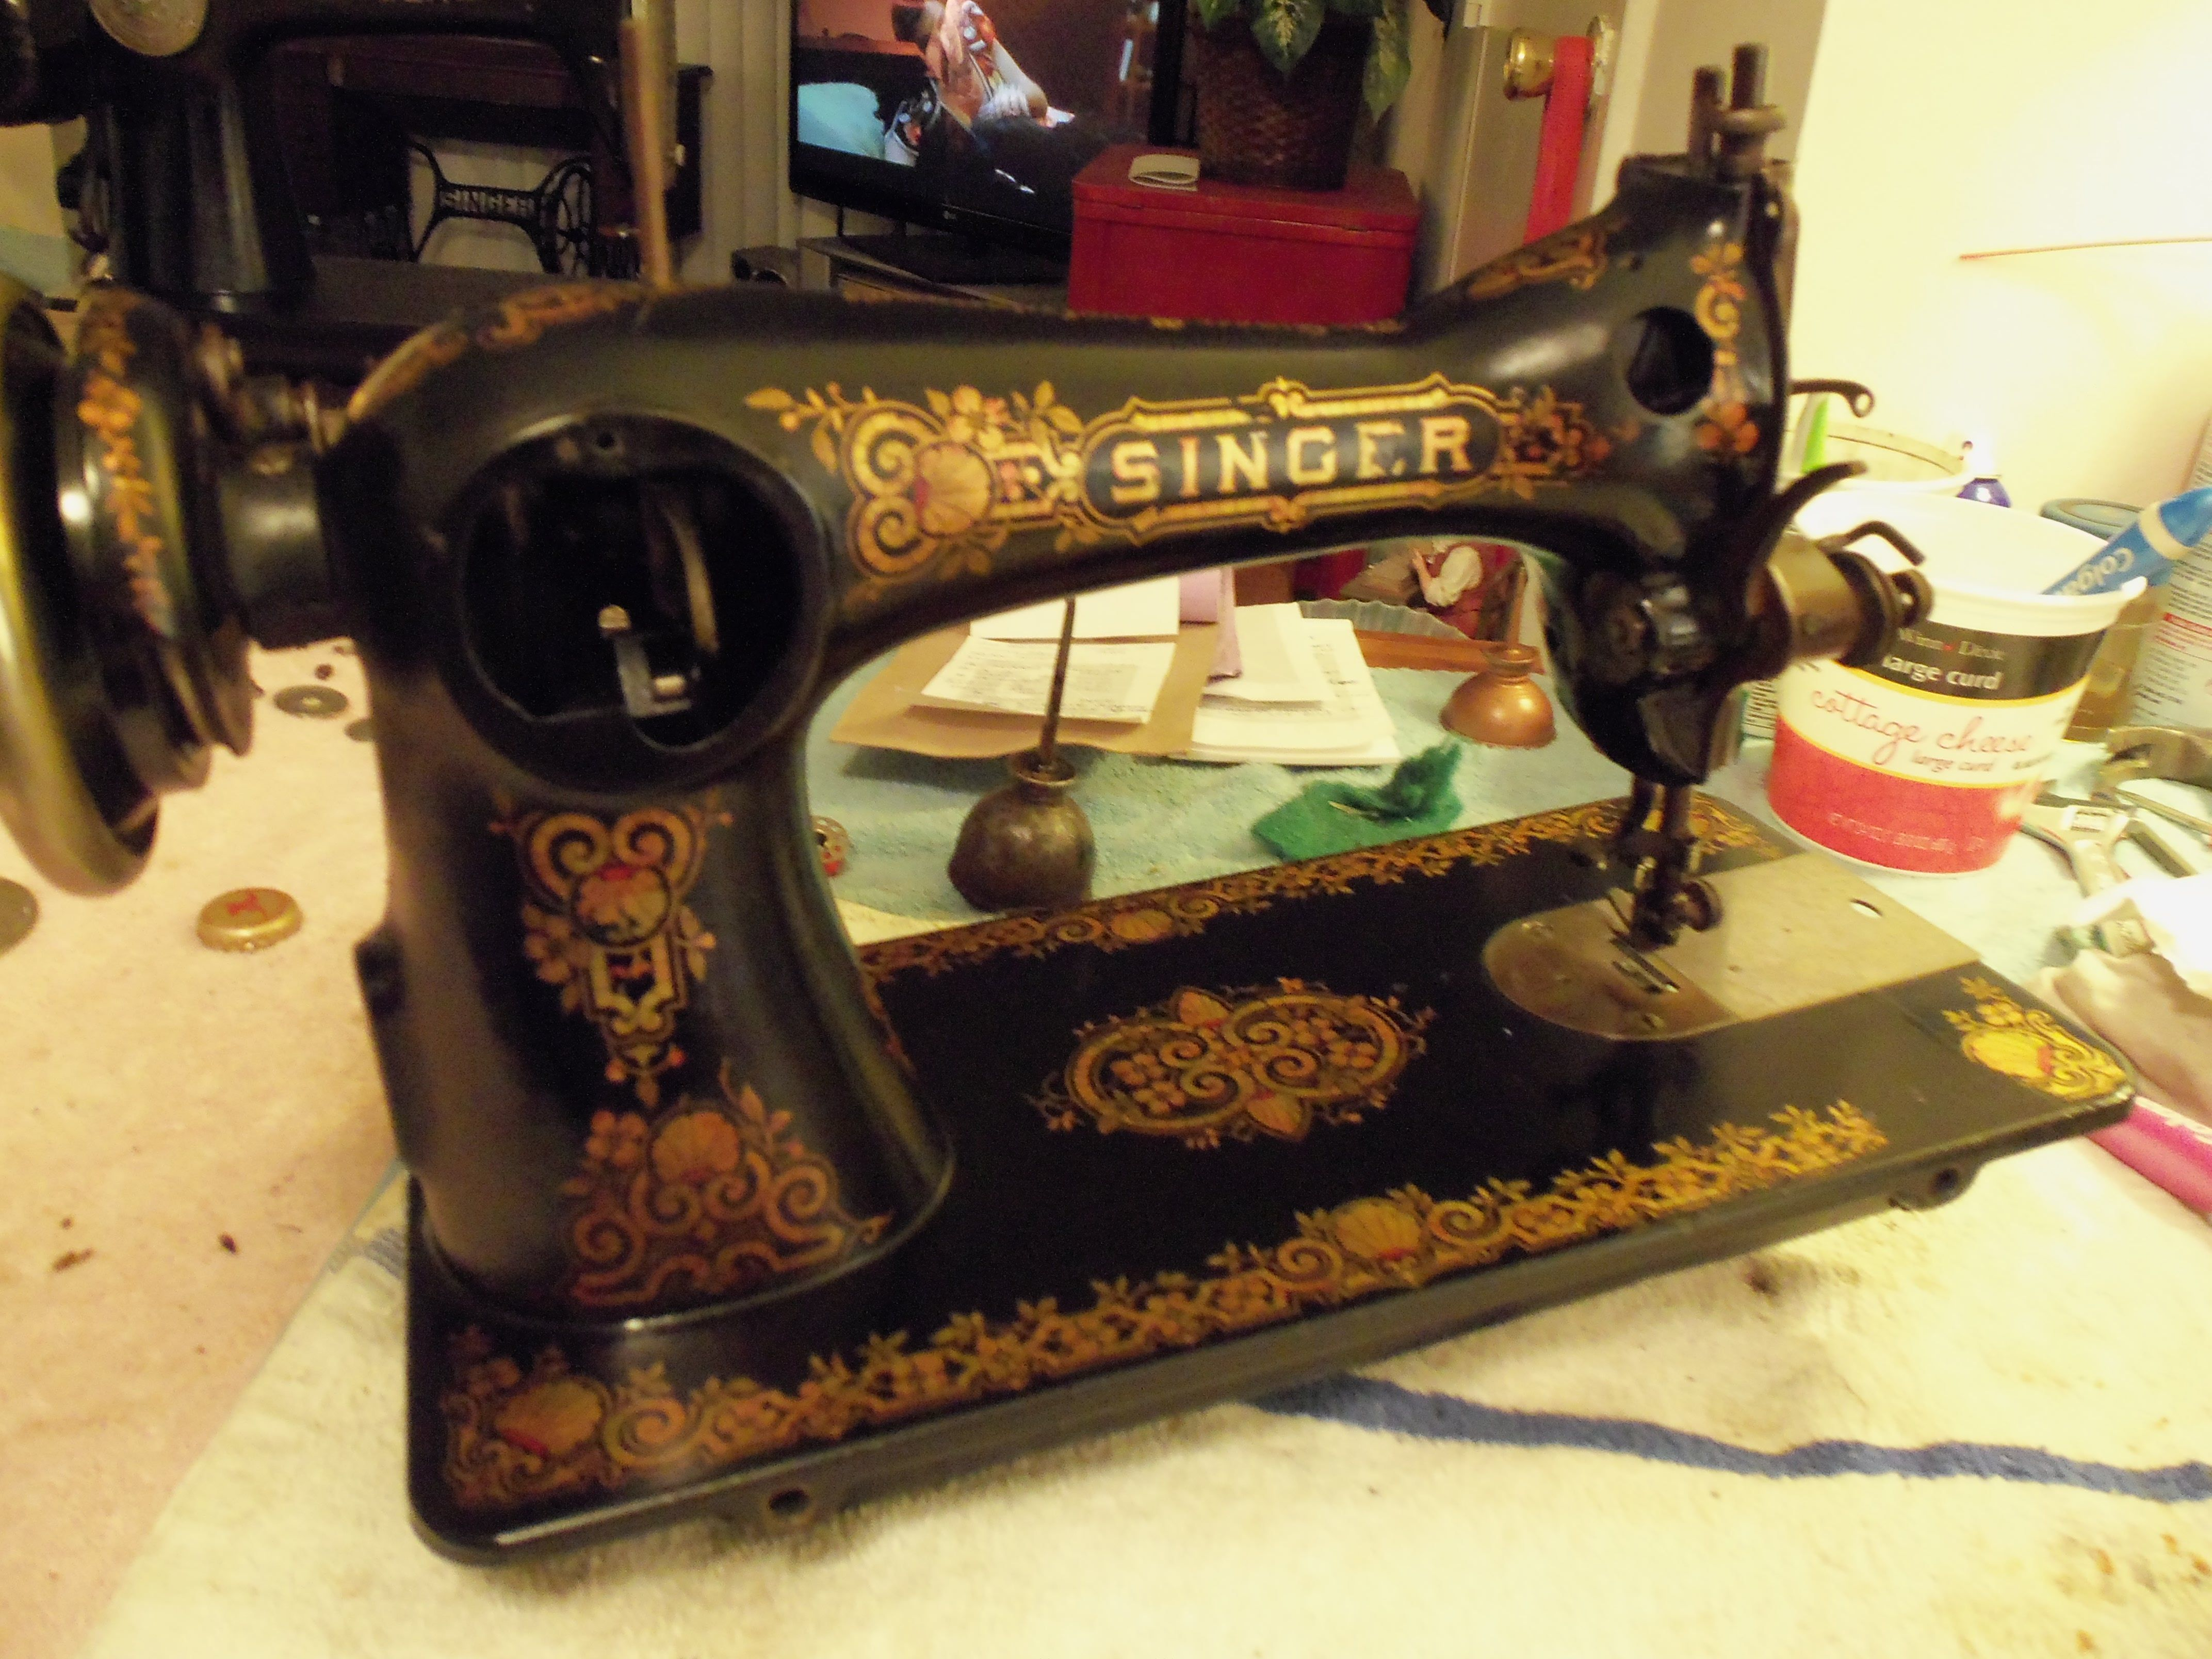 1909 Sewing Singer Treadle Machine